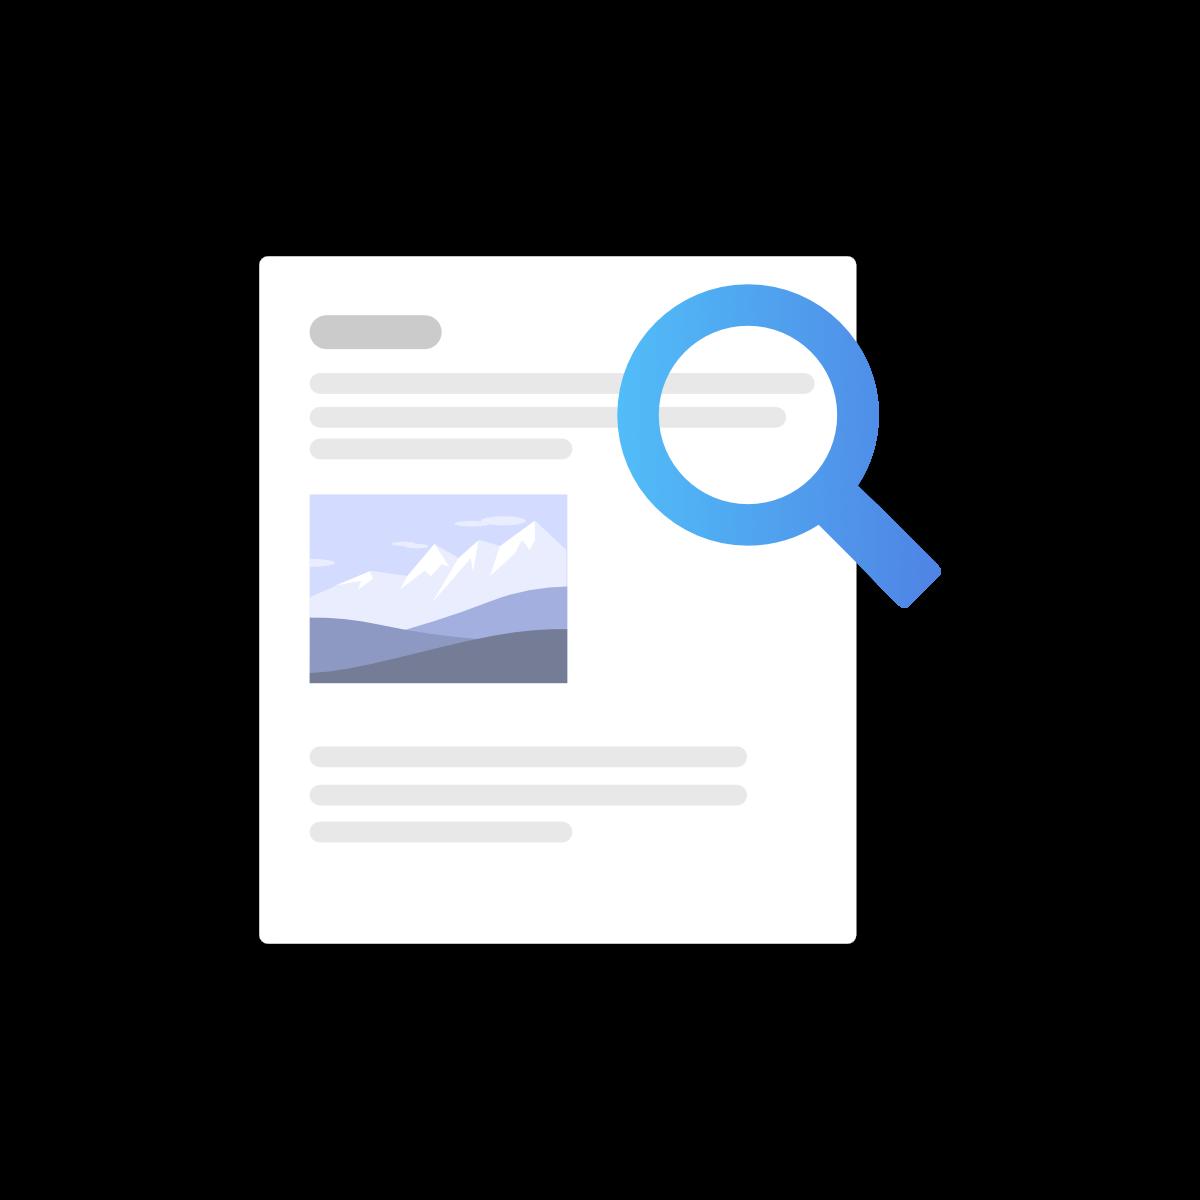 Create Workflows to Ensure Documents Progress through a Process